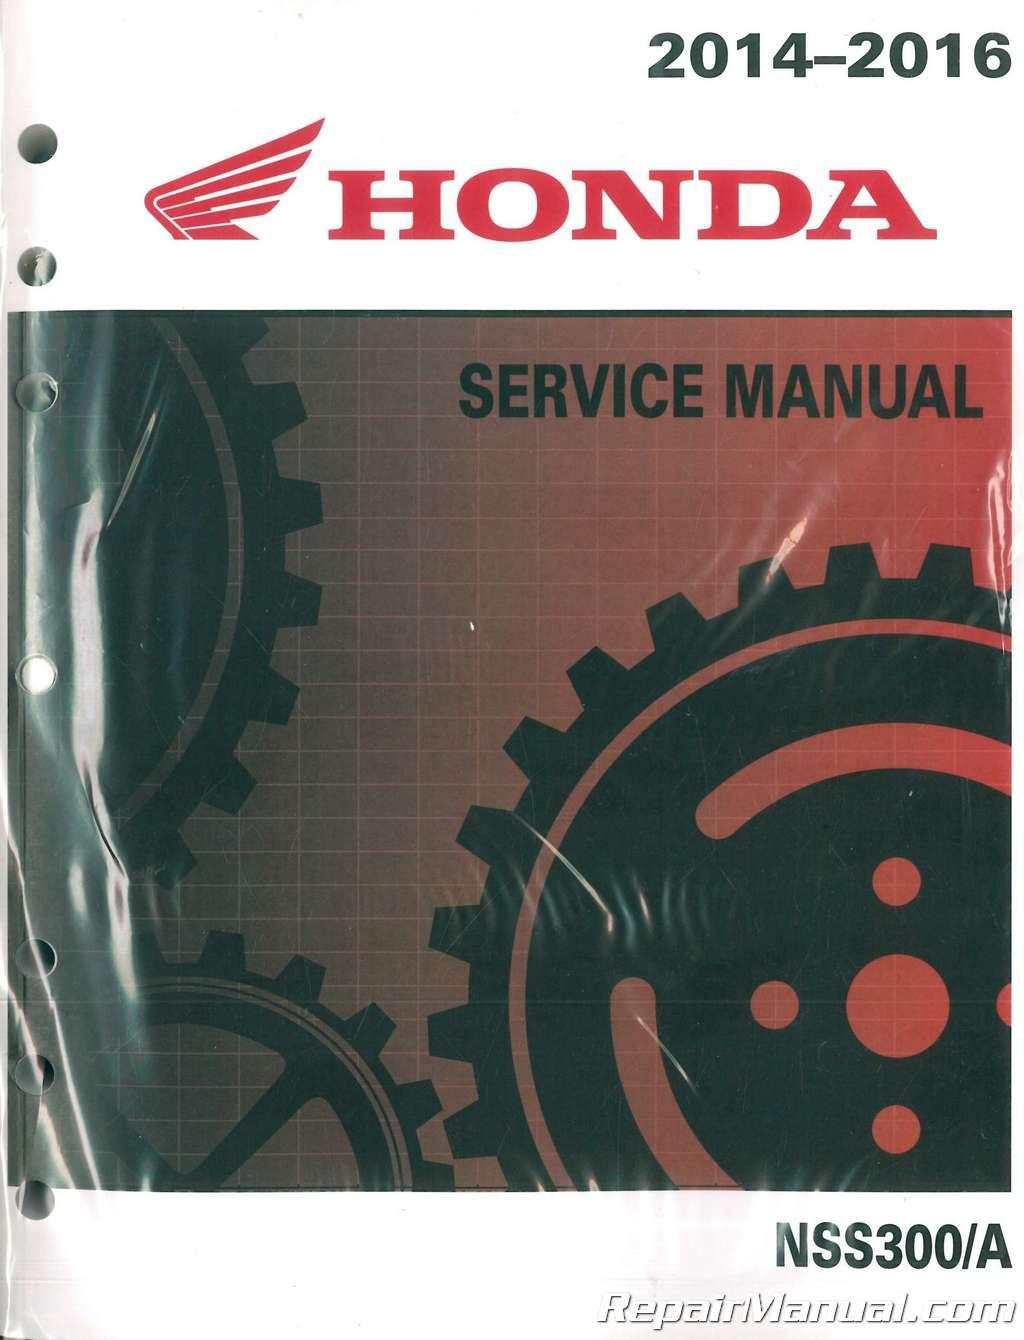 2014 2016 Honda Nss300 A Forza Scooter Service Manual